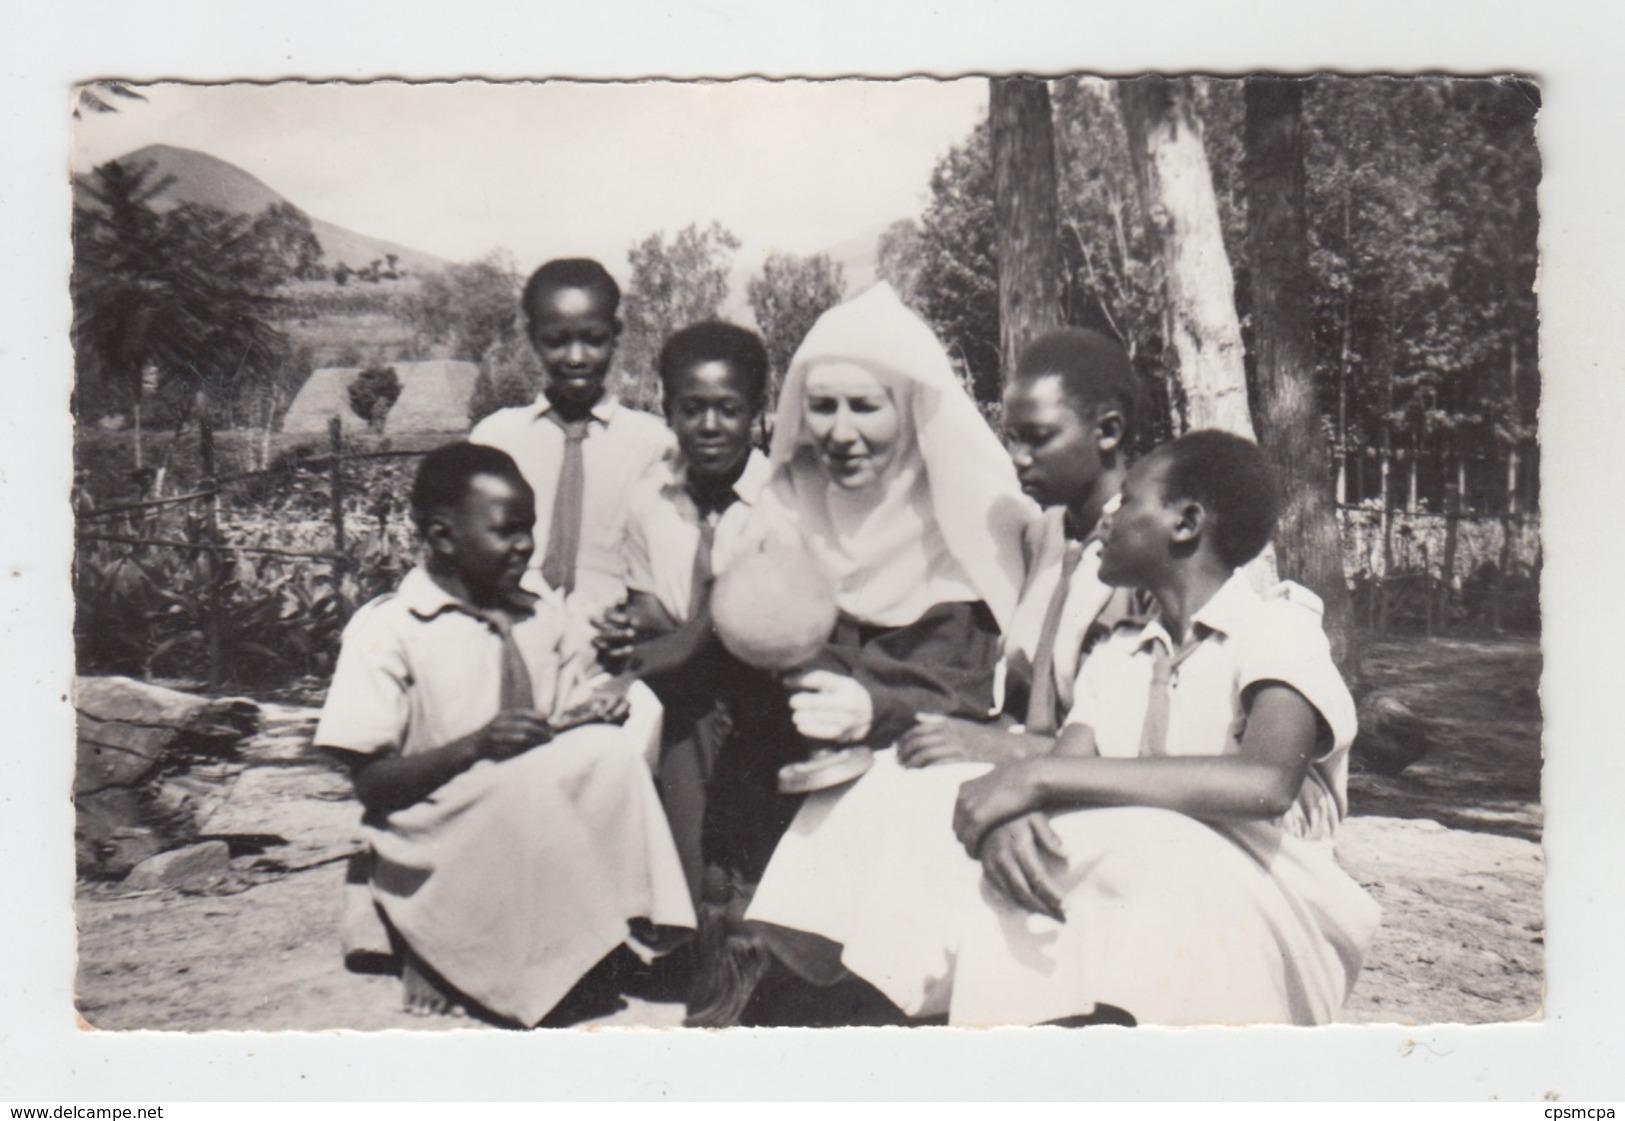 RUANDA - BIRAMBO / MISSION DES RELIGIEUSES DE L'ASSOMPTION - LECON DE GEOGRAPHIE - Ruanda-Urundi